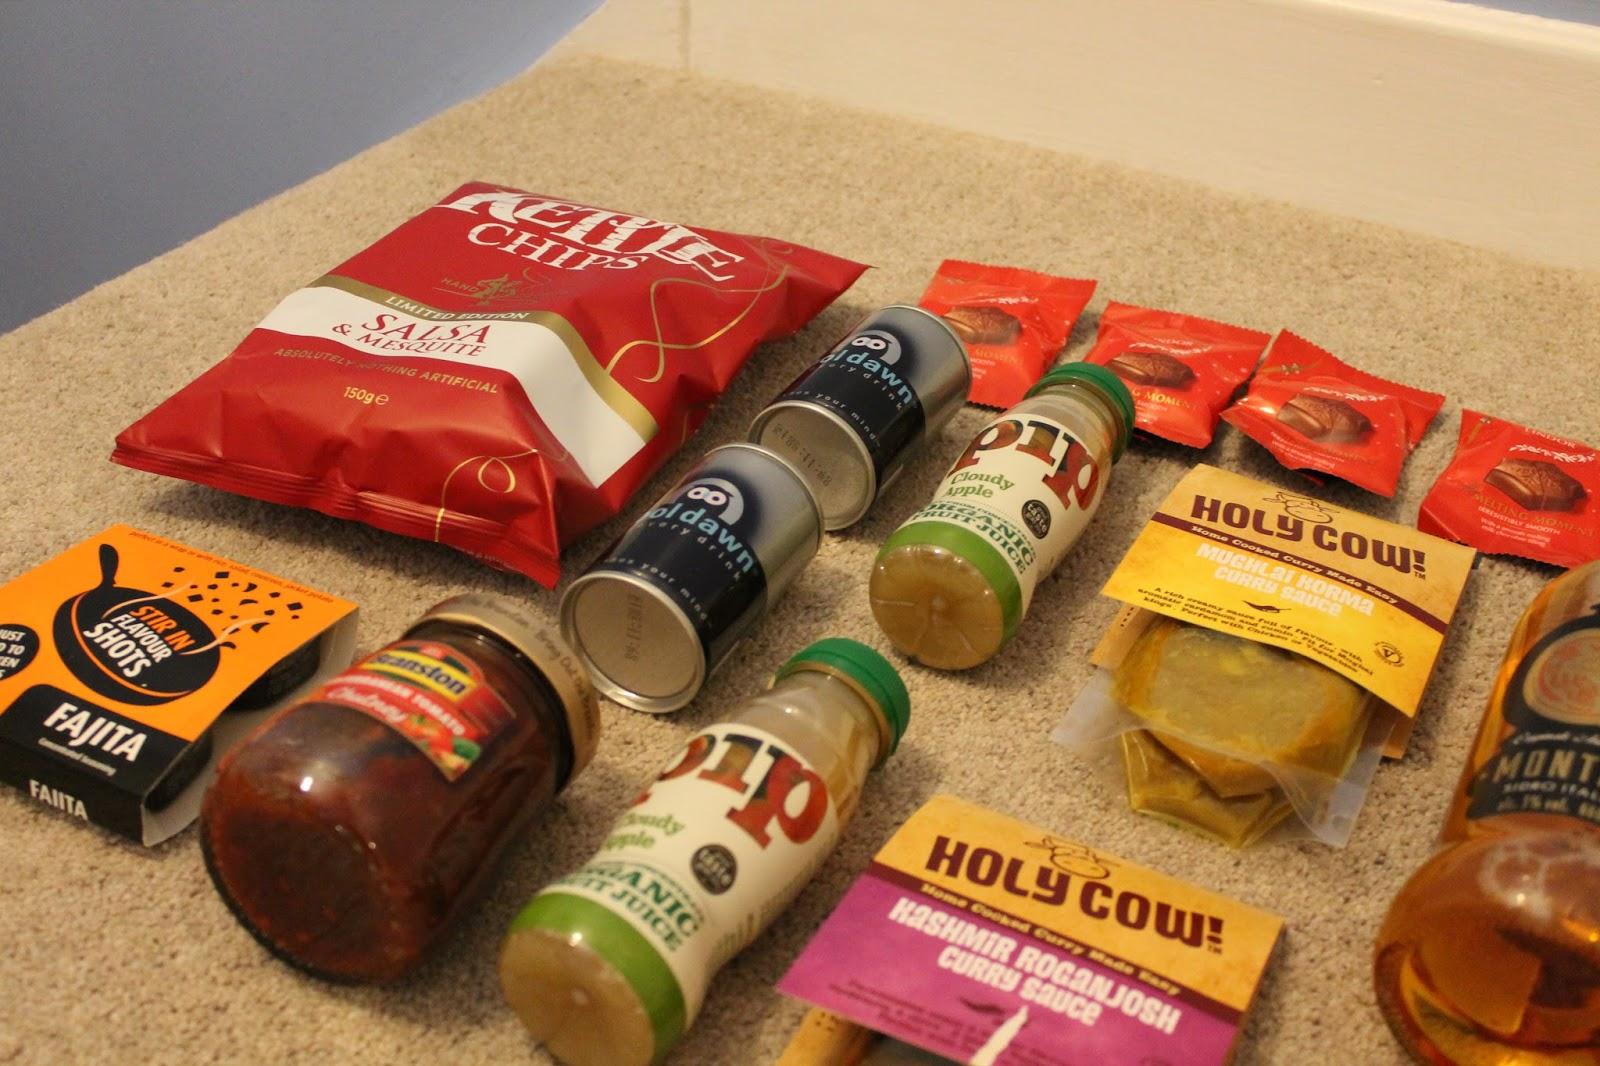 Degustabox UK November 2014 Monthly Subscription Box Contents